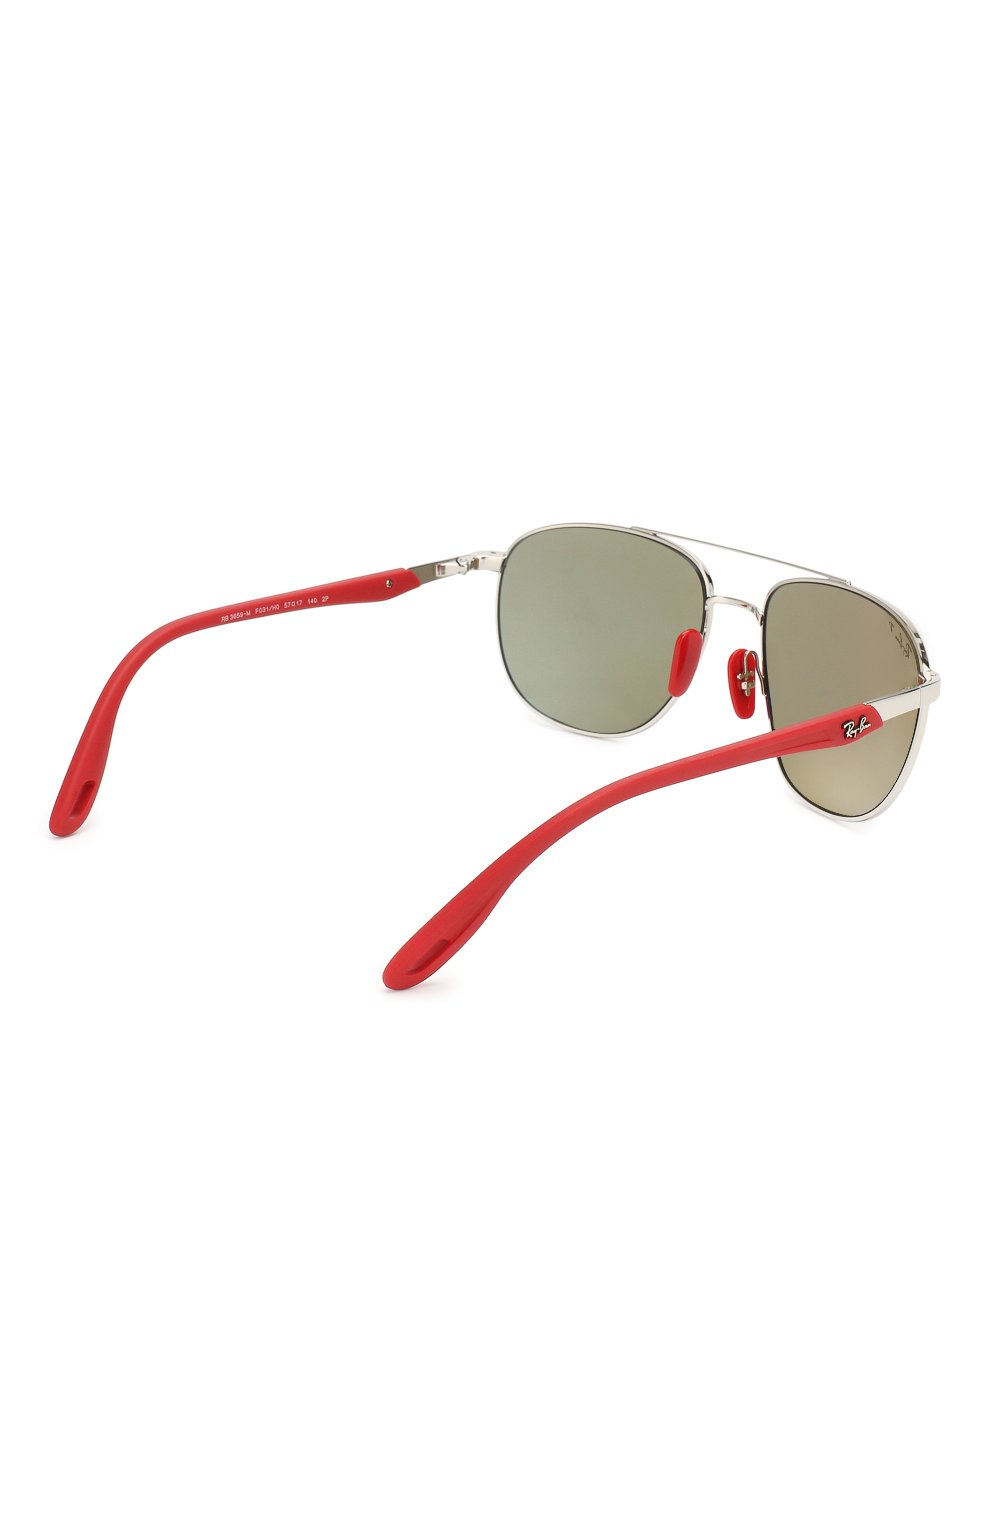 Мужские солнцезащитные очки RAY-BAN серебряного цвета, арт. 3659M-F031H0   Фото 4